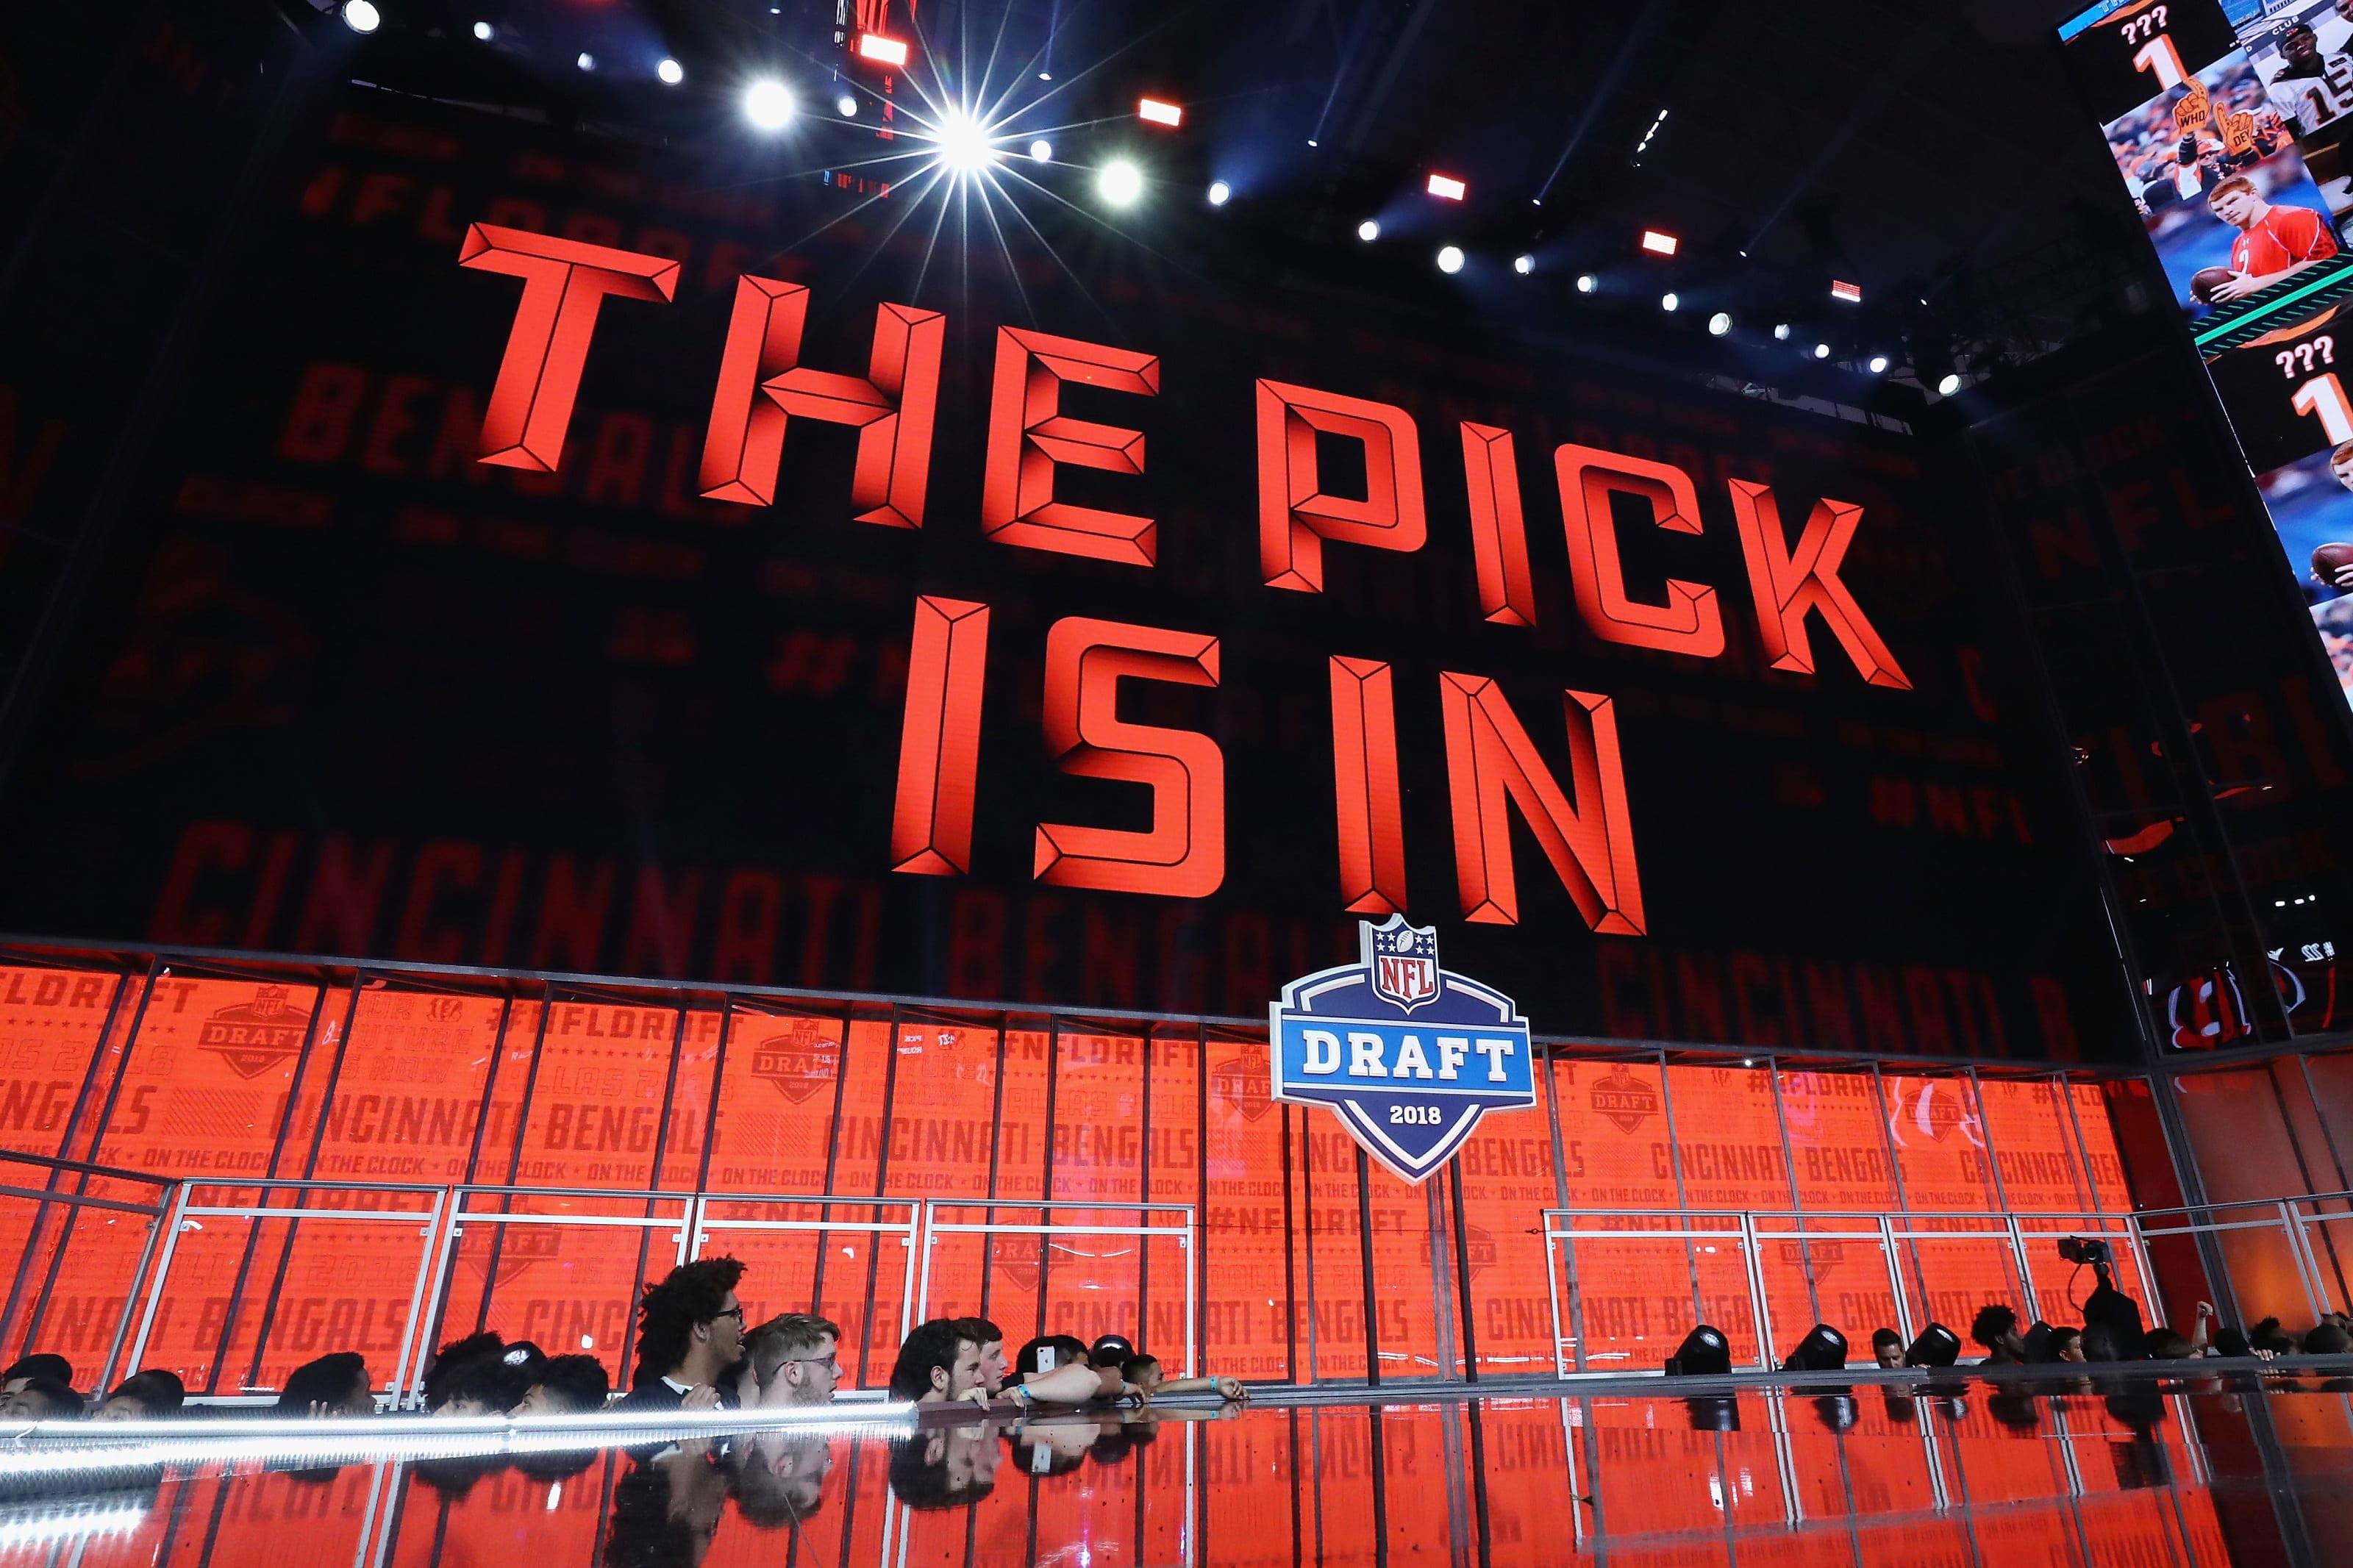 Nfl On Christmas 2020 2020 NFL Draft: Joy to the World! Christmas Eve 3 round mock draft